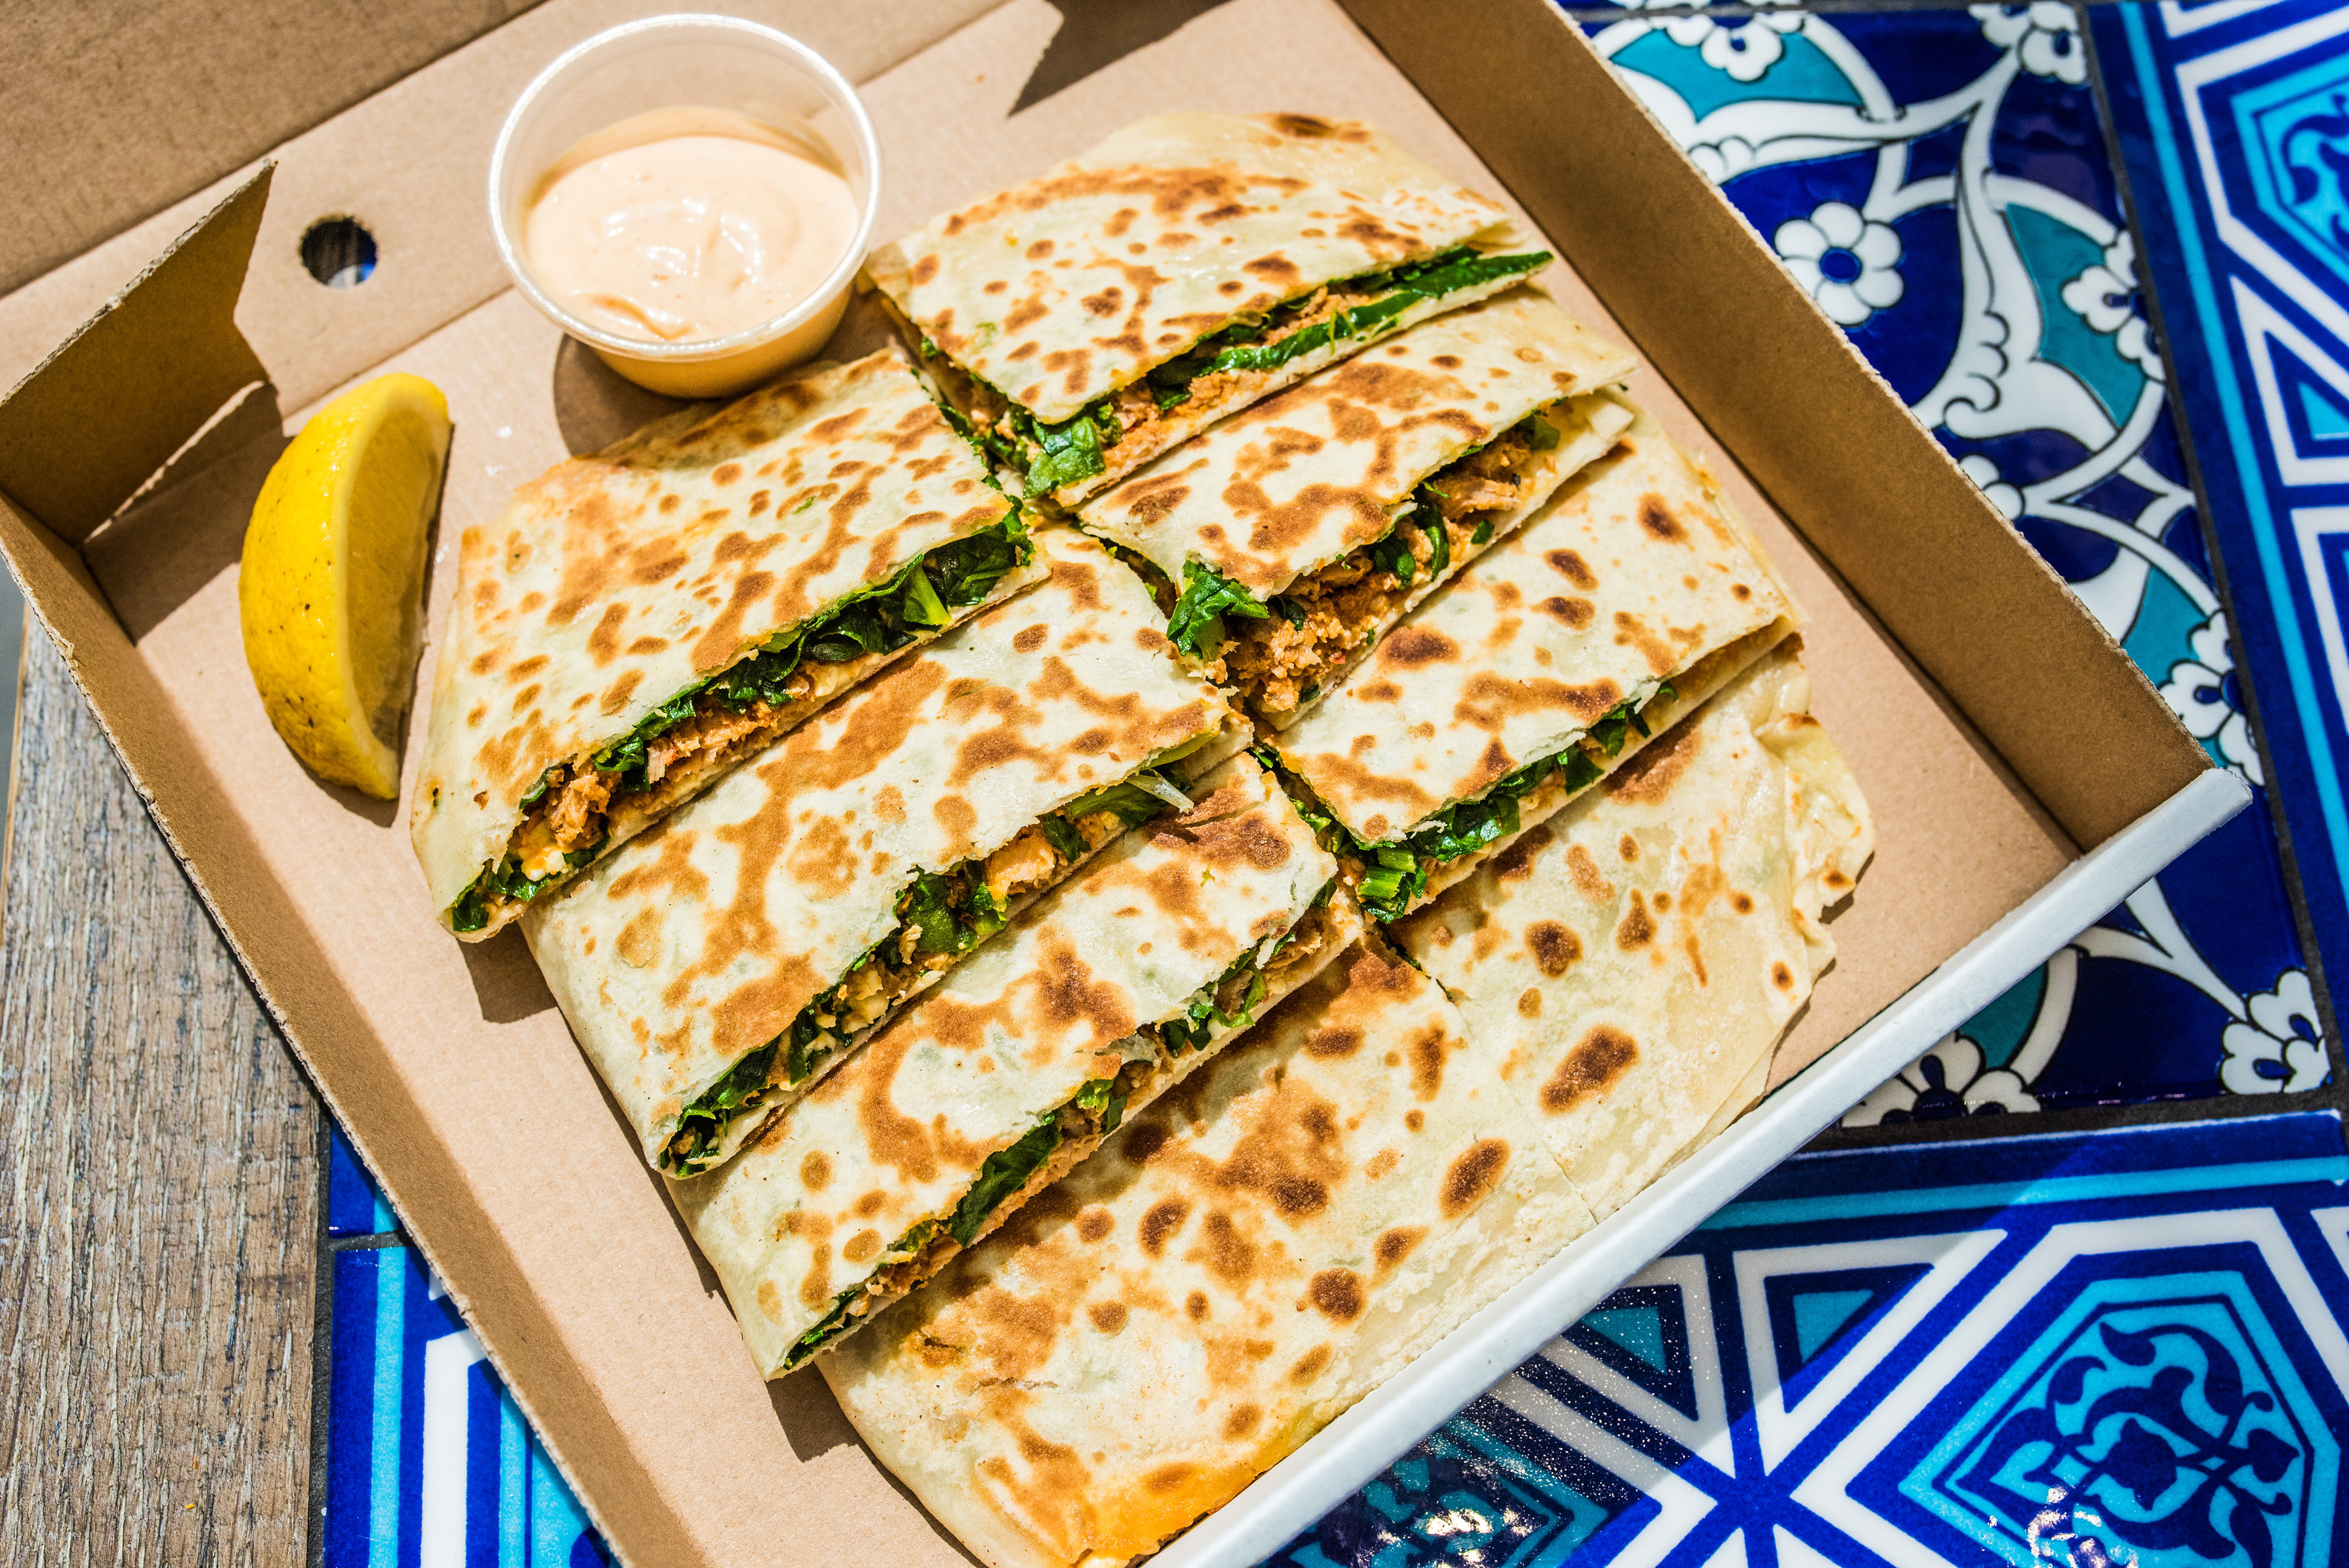 healthy-fresh-fast-gozleme-king-australias-premier-turkish-street-food-1